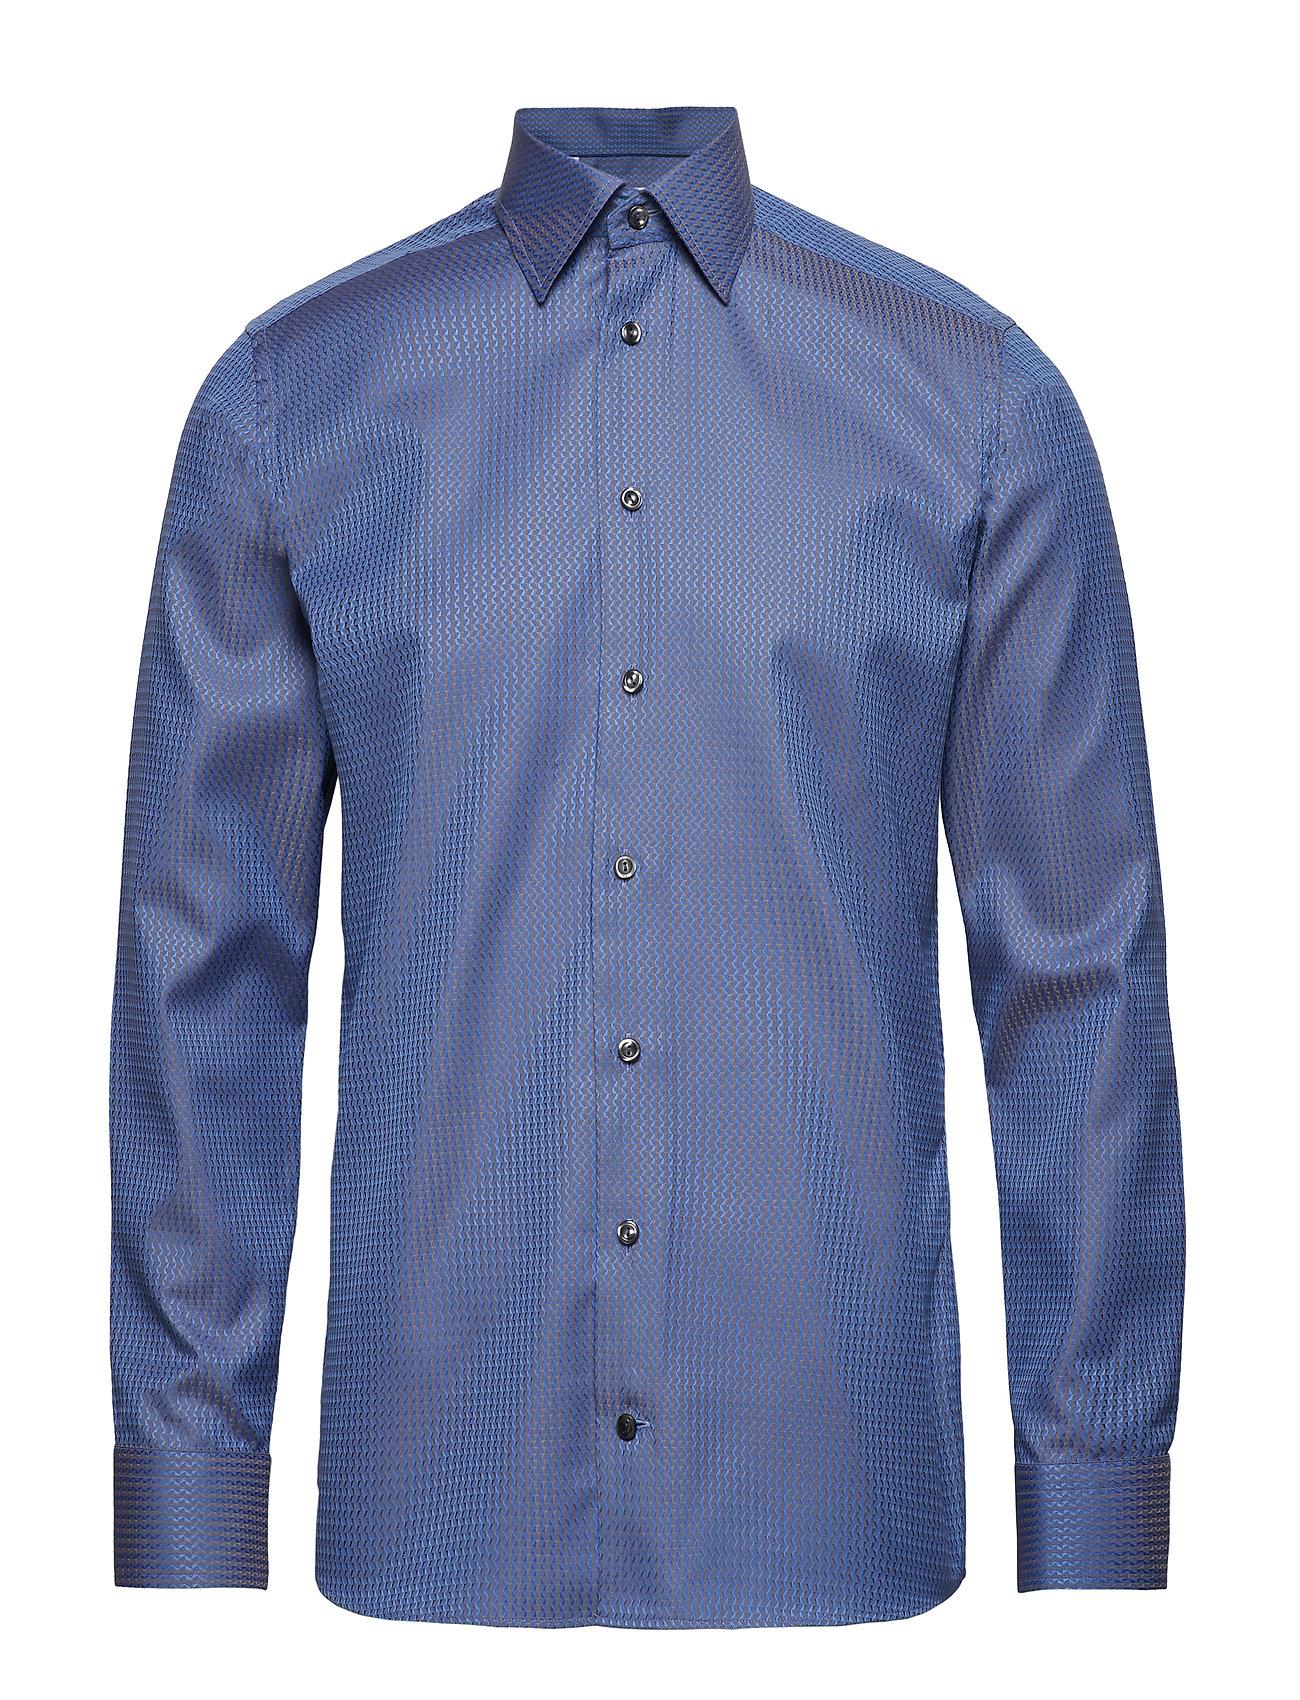 Eton Blue & Beige Jacquard Shirt - BLUE